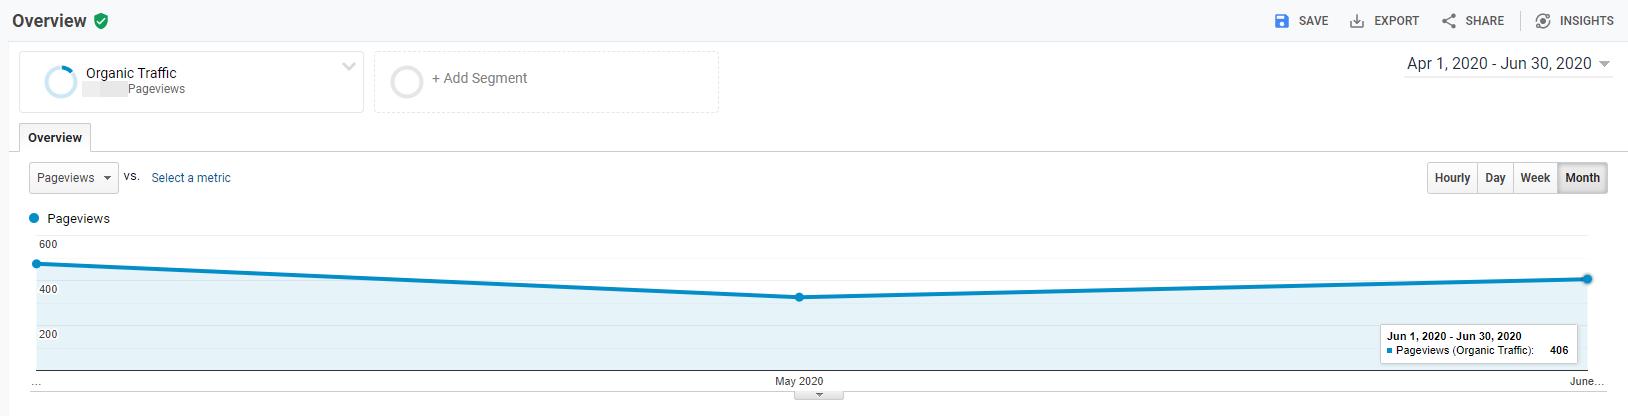 Client Organic Traffic in Apr - Jun 2020